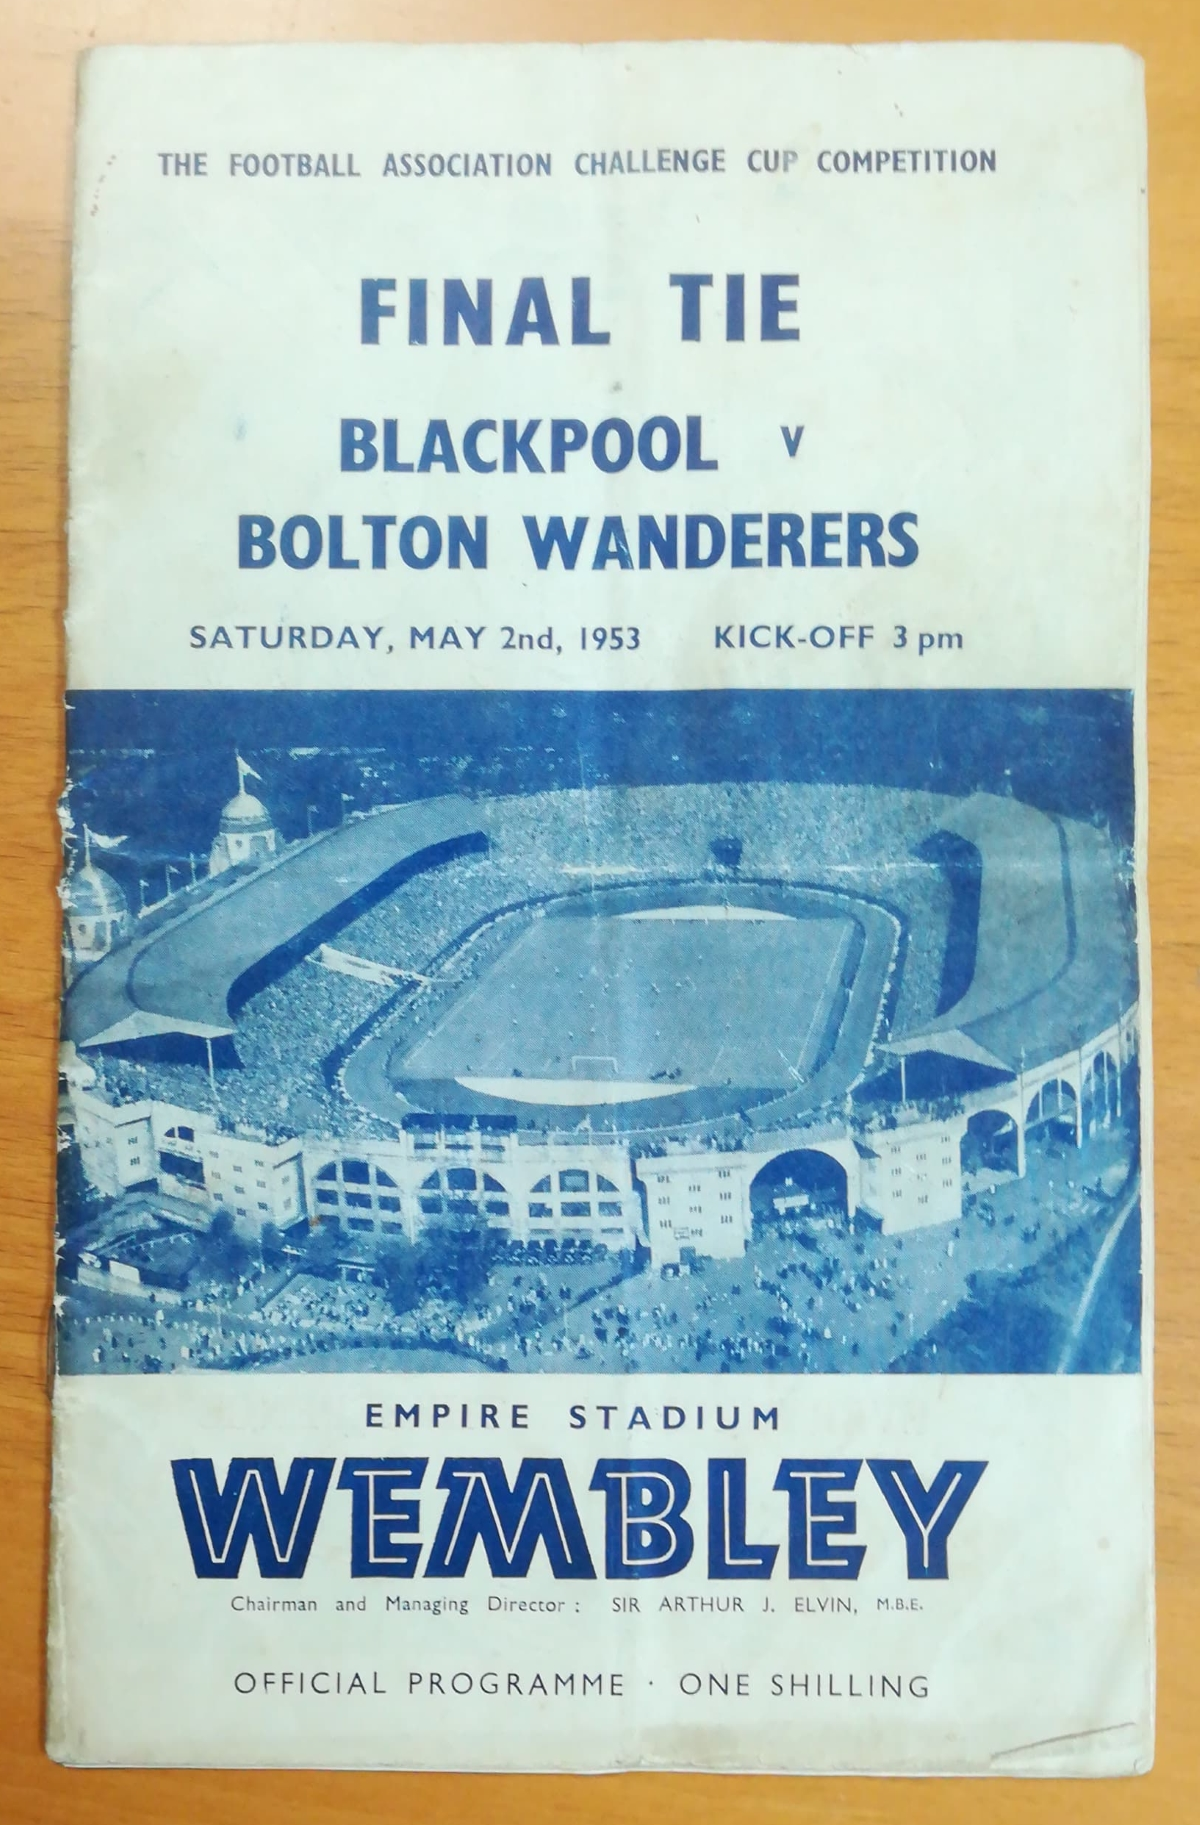 FA Cup final 1953 memorabilia collector